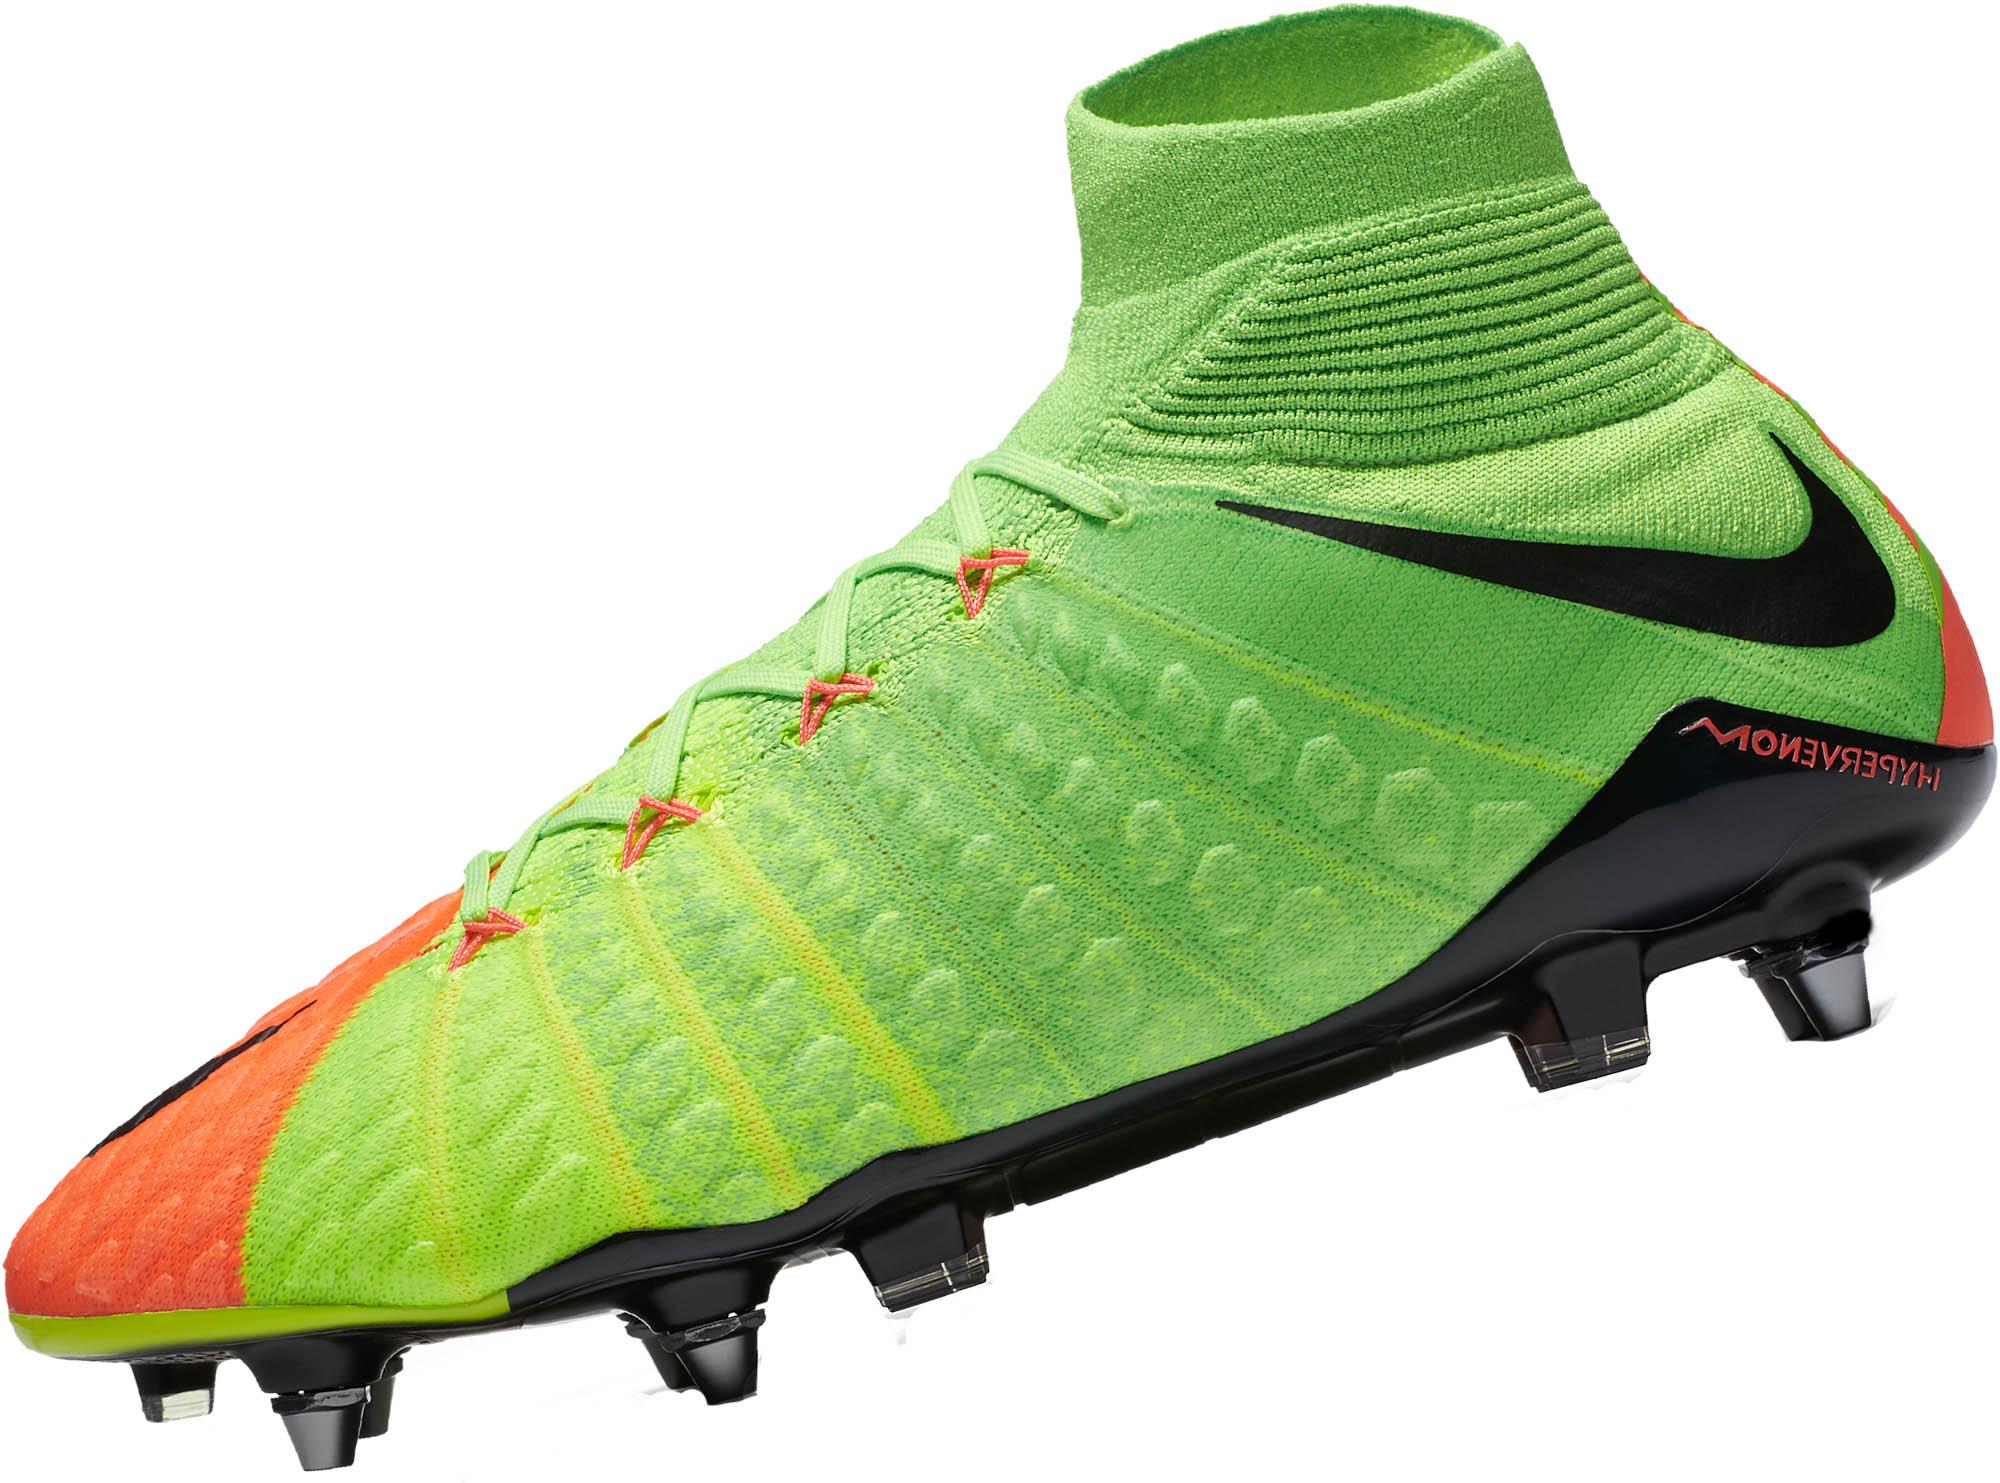 bbf2f6efd Nike Hypervenom Phantom DF III SG-Pro – Electric Green/Hyper Orange